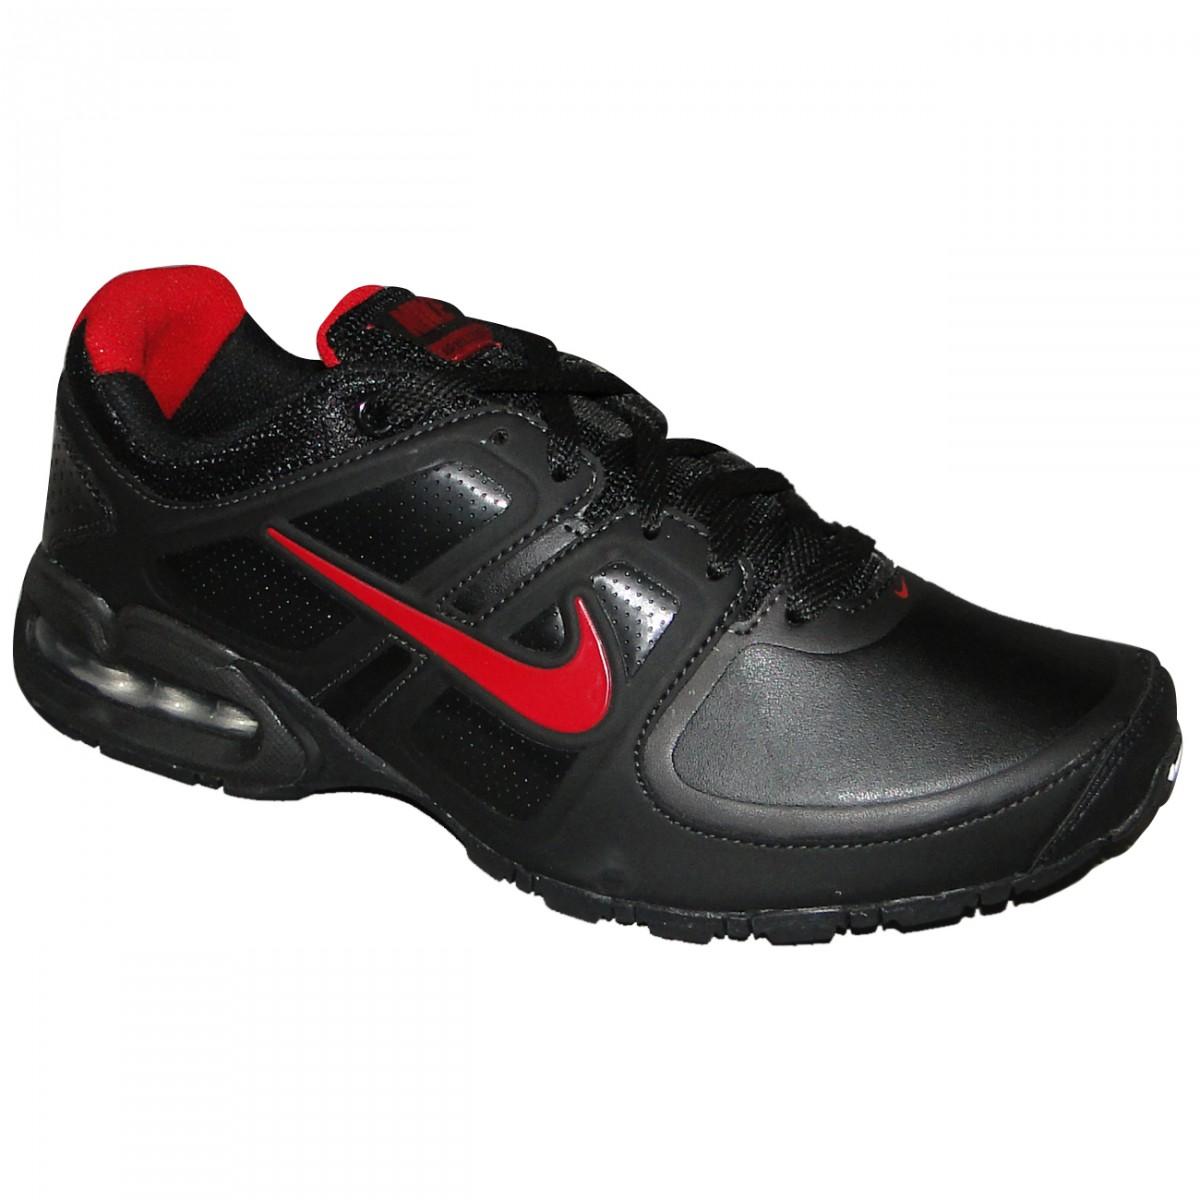 329c0ab57d9 Tênis Nike Air Max Lte Ii Sl 512765-004 - PRETO VERMELHO - Chuteira Nike